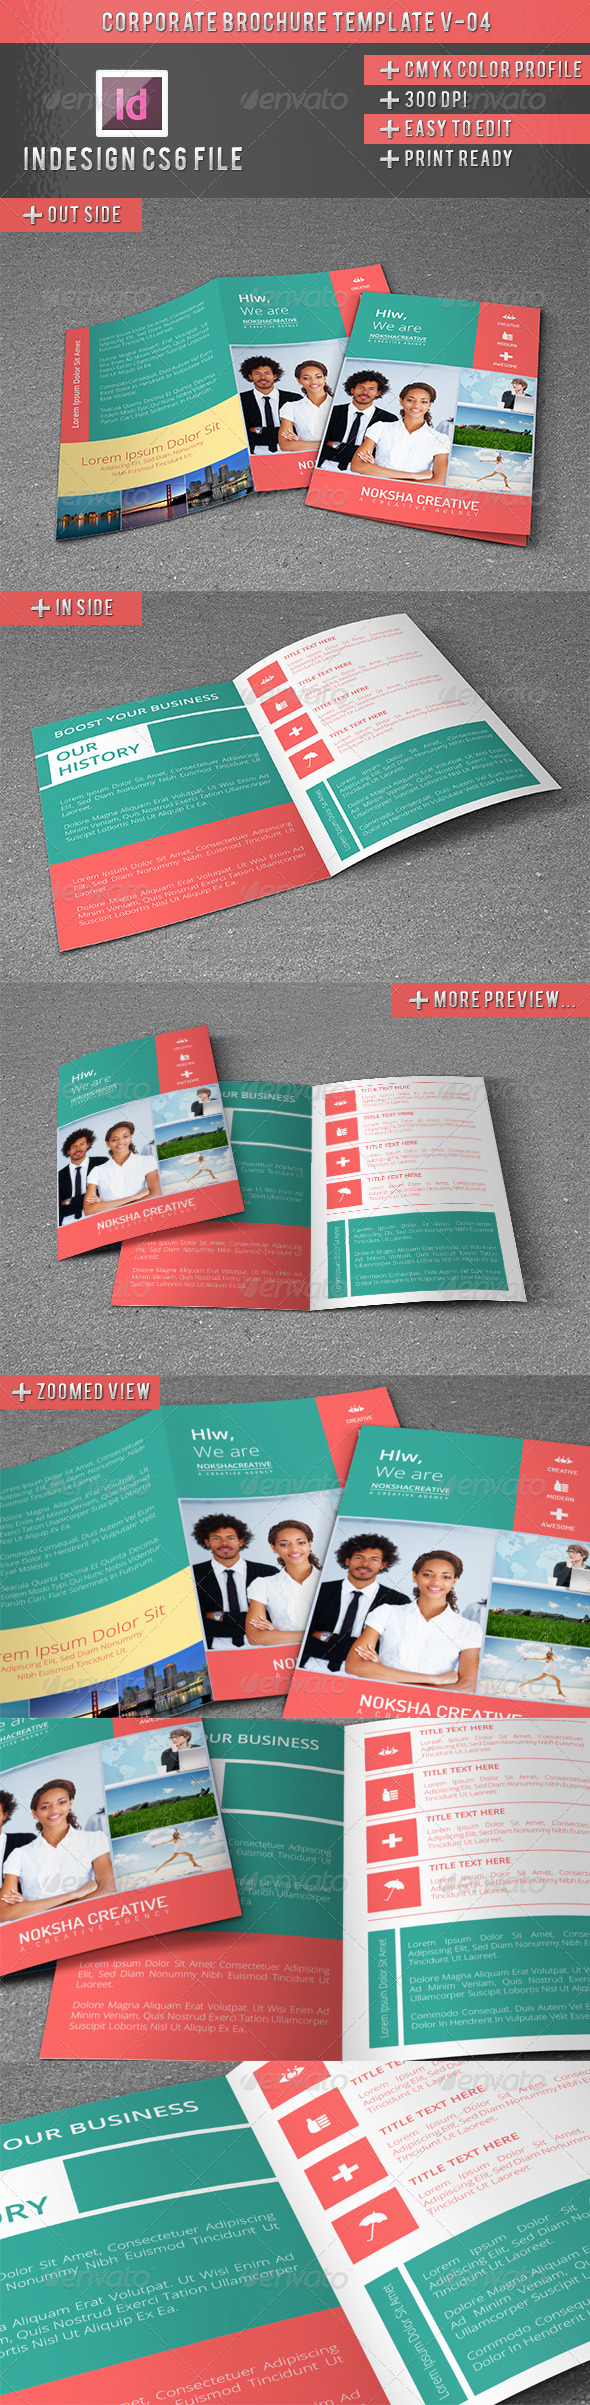 GraphicRiver Corporate BiFold Brochure V-04 5323495